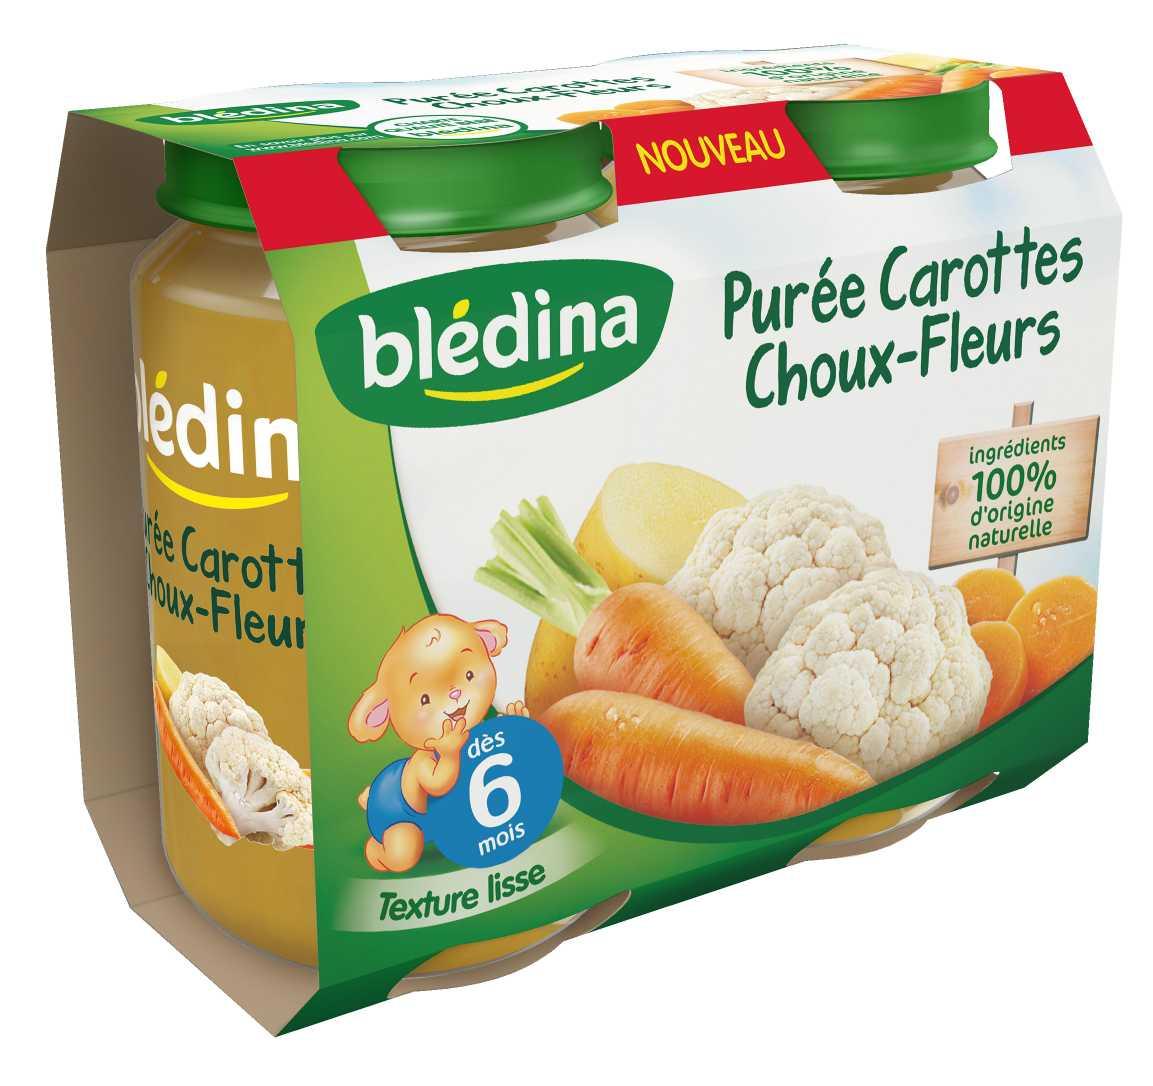 Pot Purée Carottes Choux-fleurs 2x200g BLEDINA